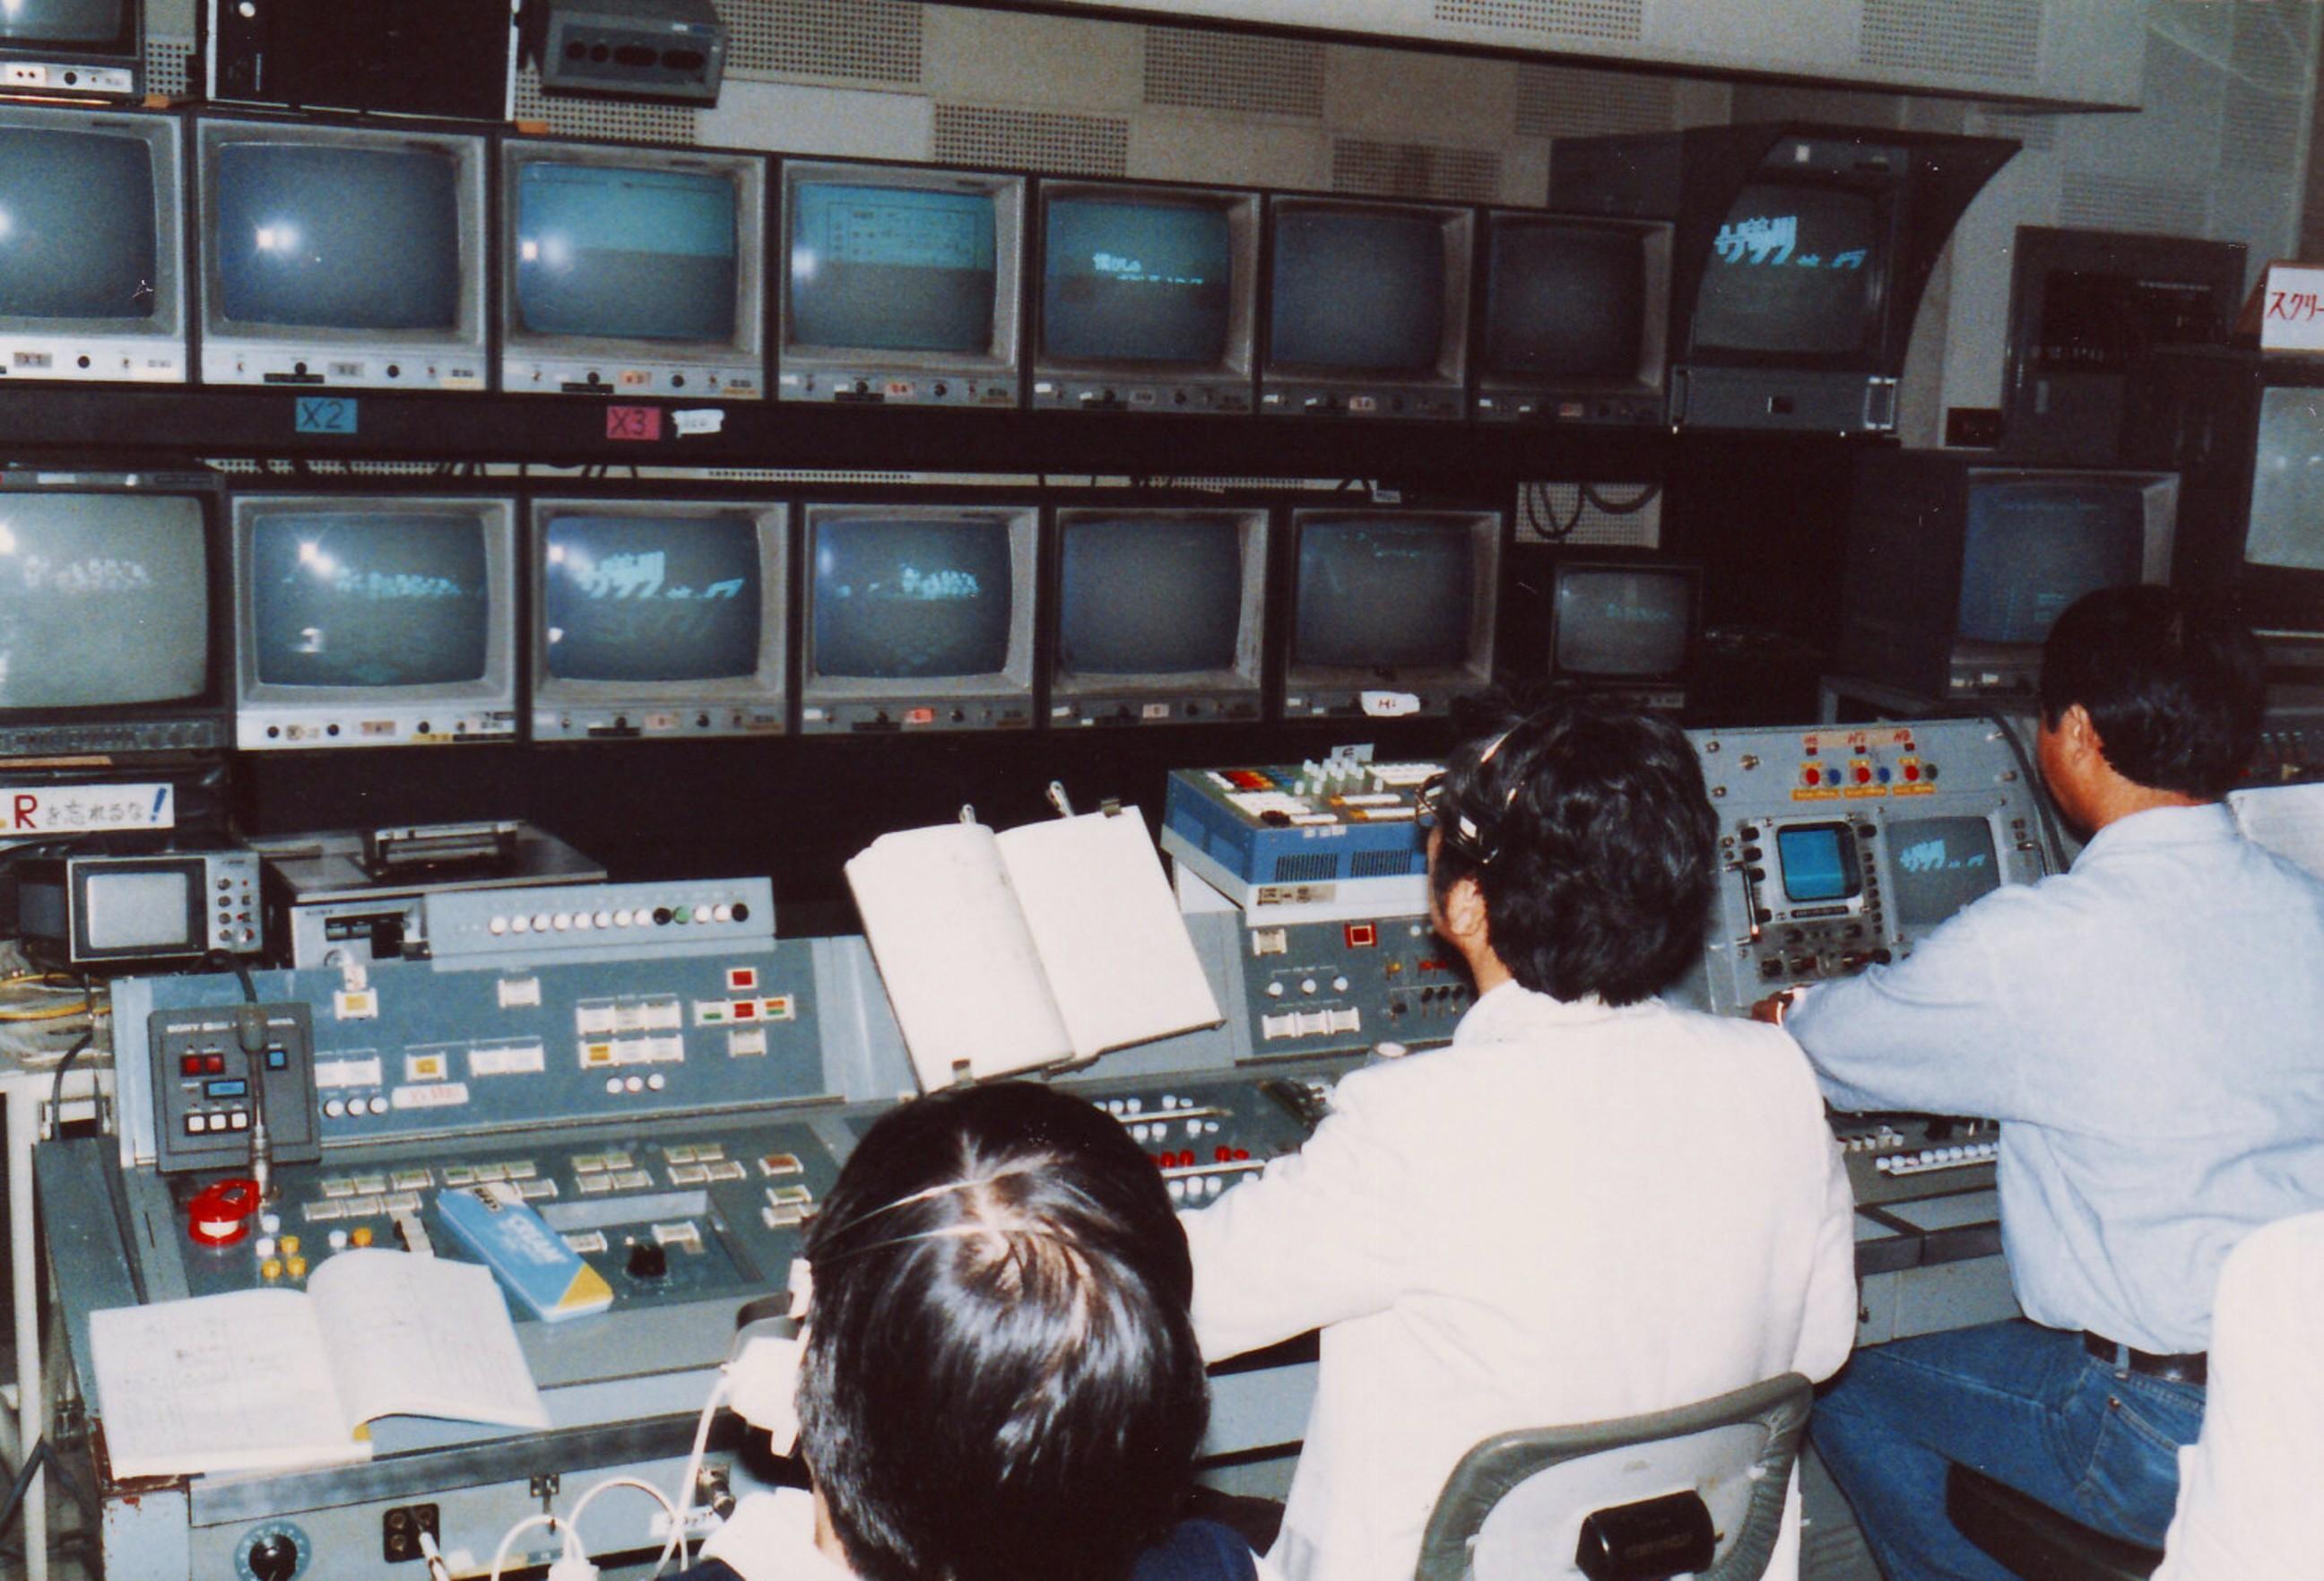 Incredible File:NHKn tv-studion ohjaamo - Master Control Room NHK, Tokyo. 2592 x 1763 · 715 kB · jpeg